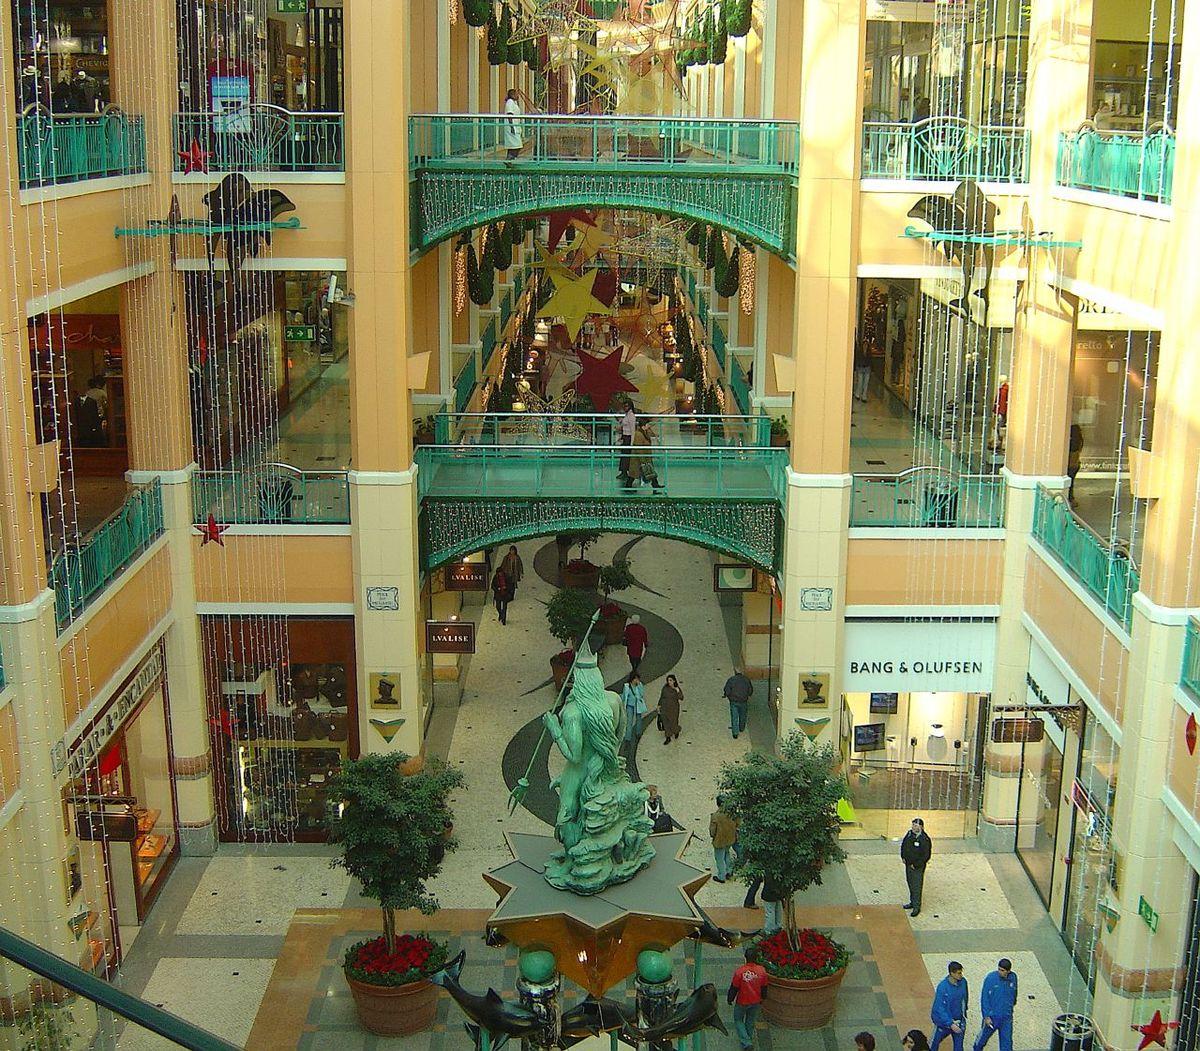 centro comercial gemini lisboa mapa Colombo Centre   Wikipedia centro comercial gemini lisboa mapa